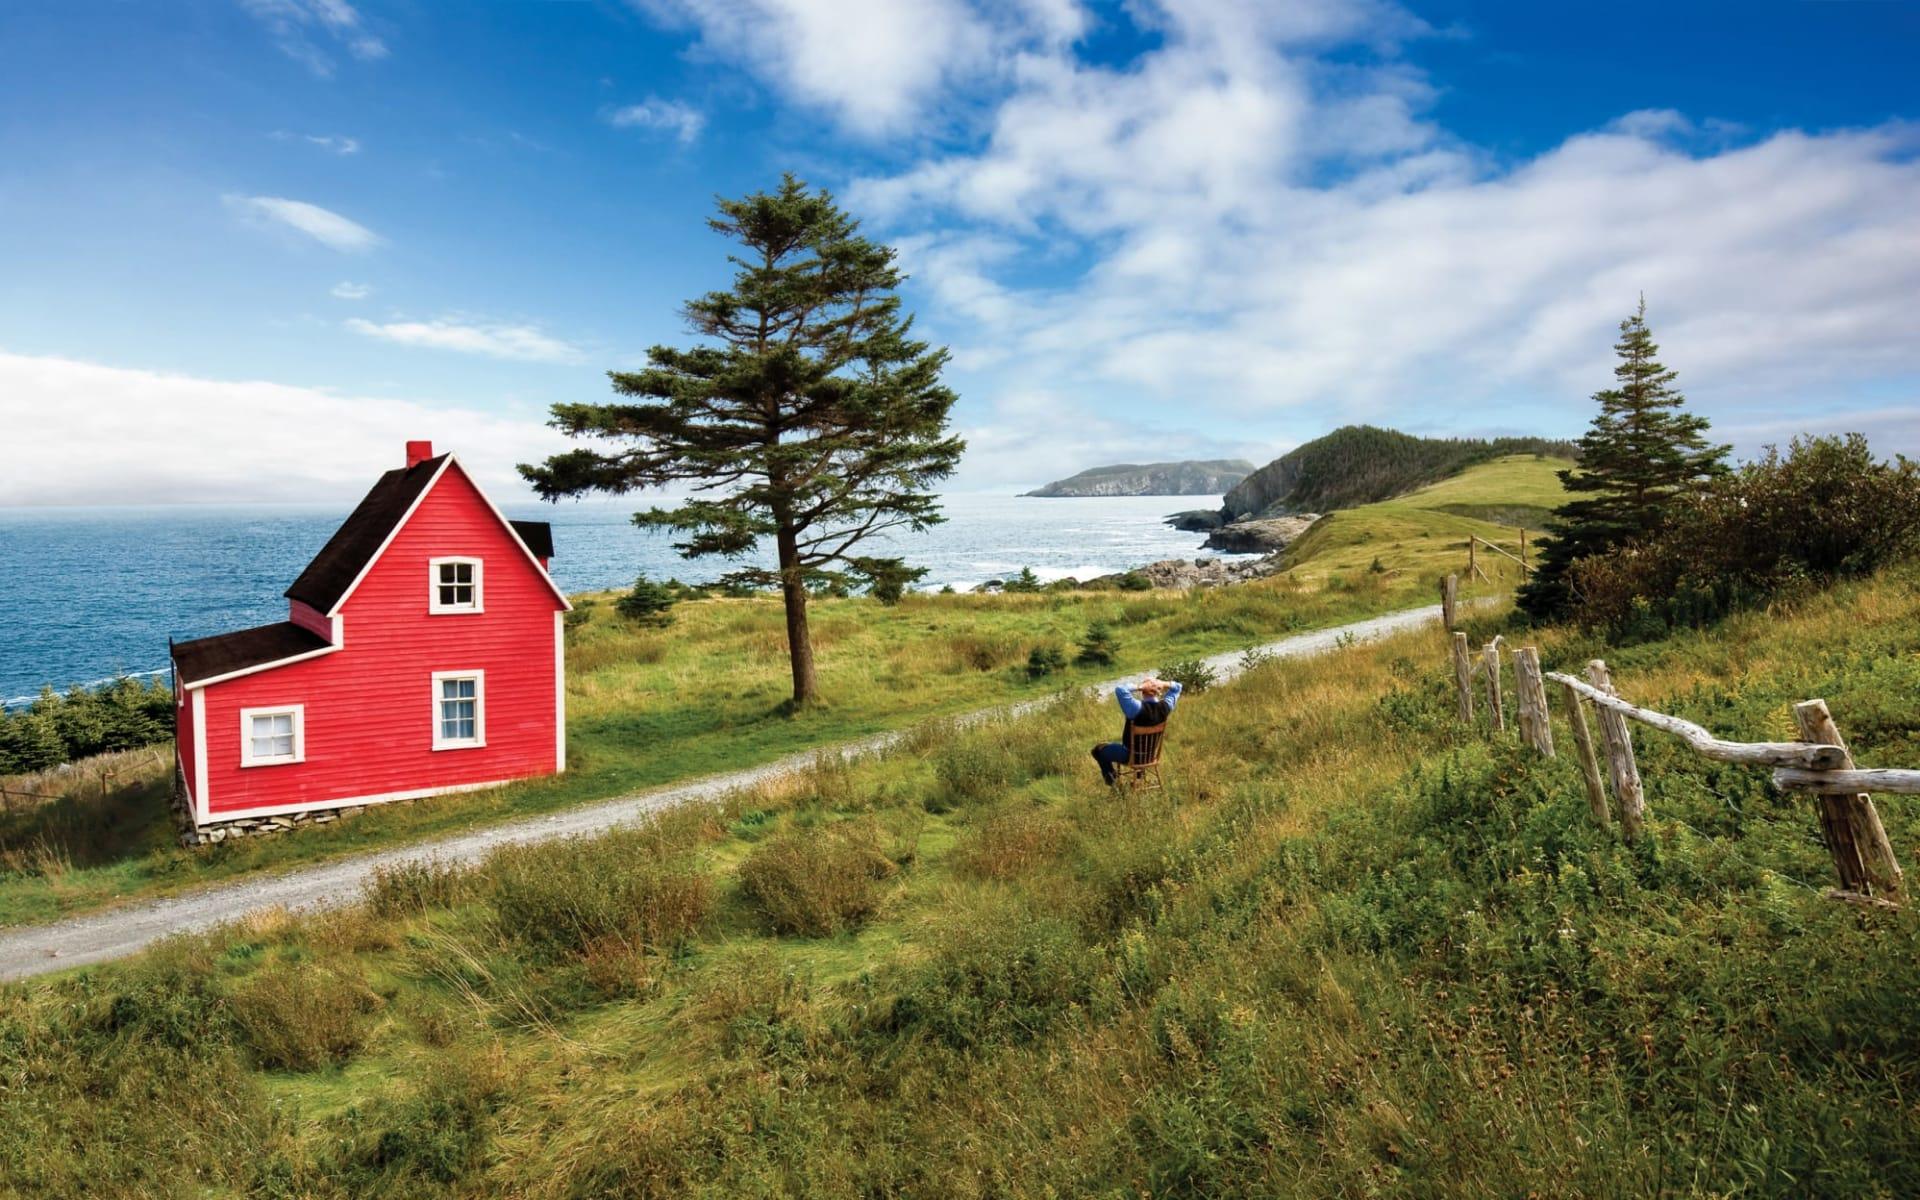 Abenteuer Labrador und Neufundland ab St. John's: Avalon-Red House Tors Cove EXTENDED LEFT_Tourbase